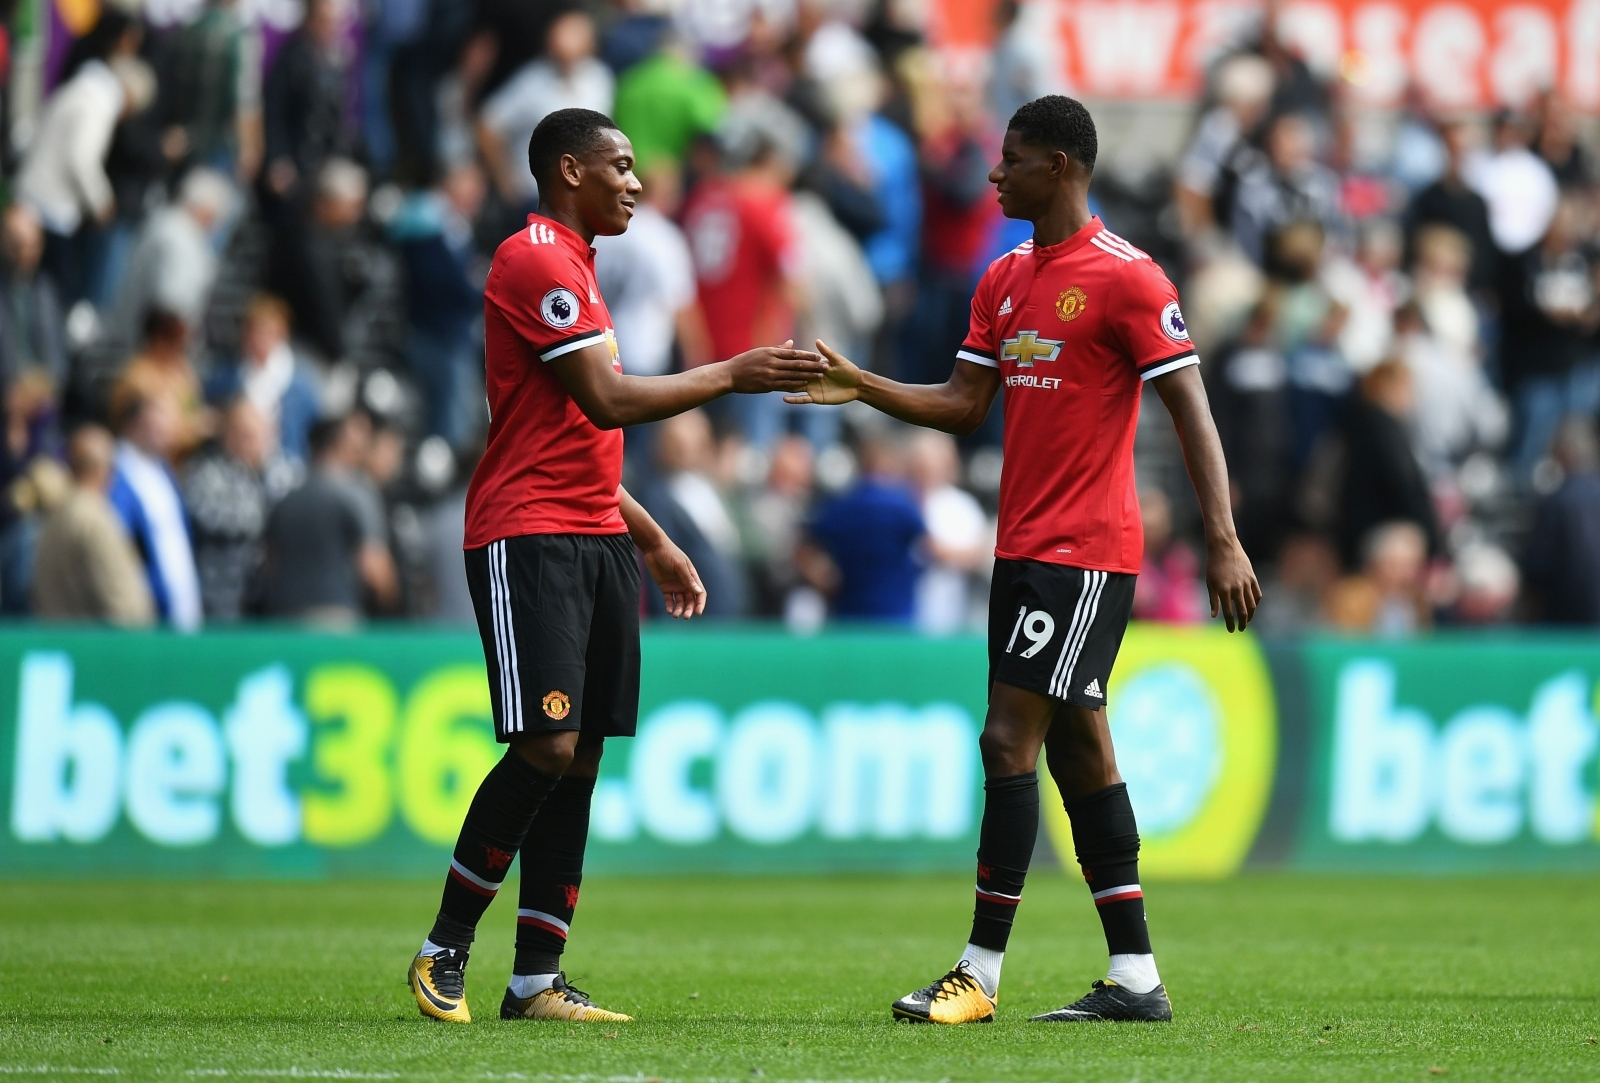 Manchester United striker Marcus Rashford among six English nominees for 2017 Golden Boy award